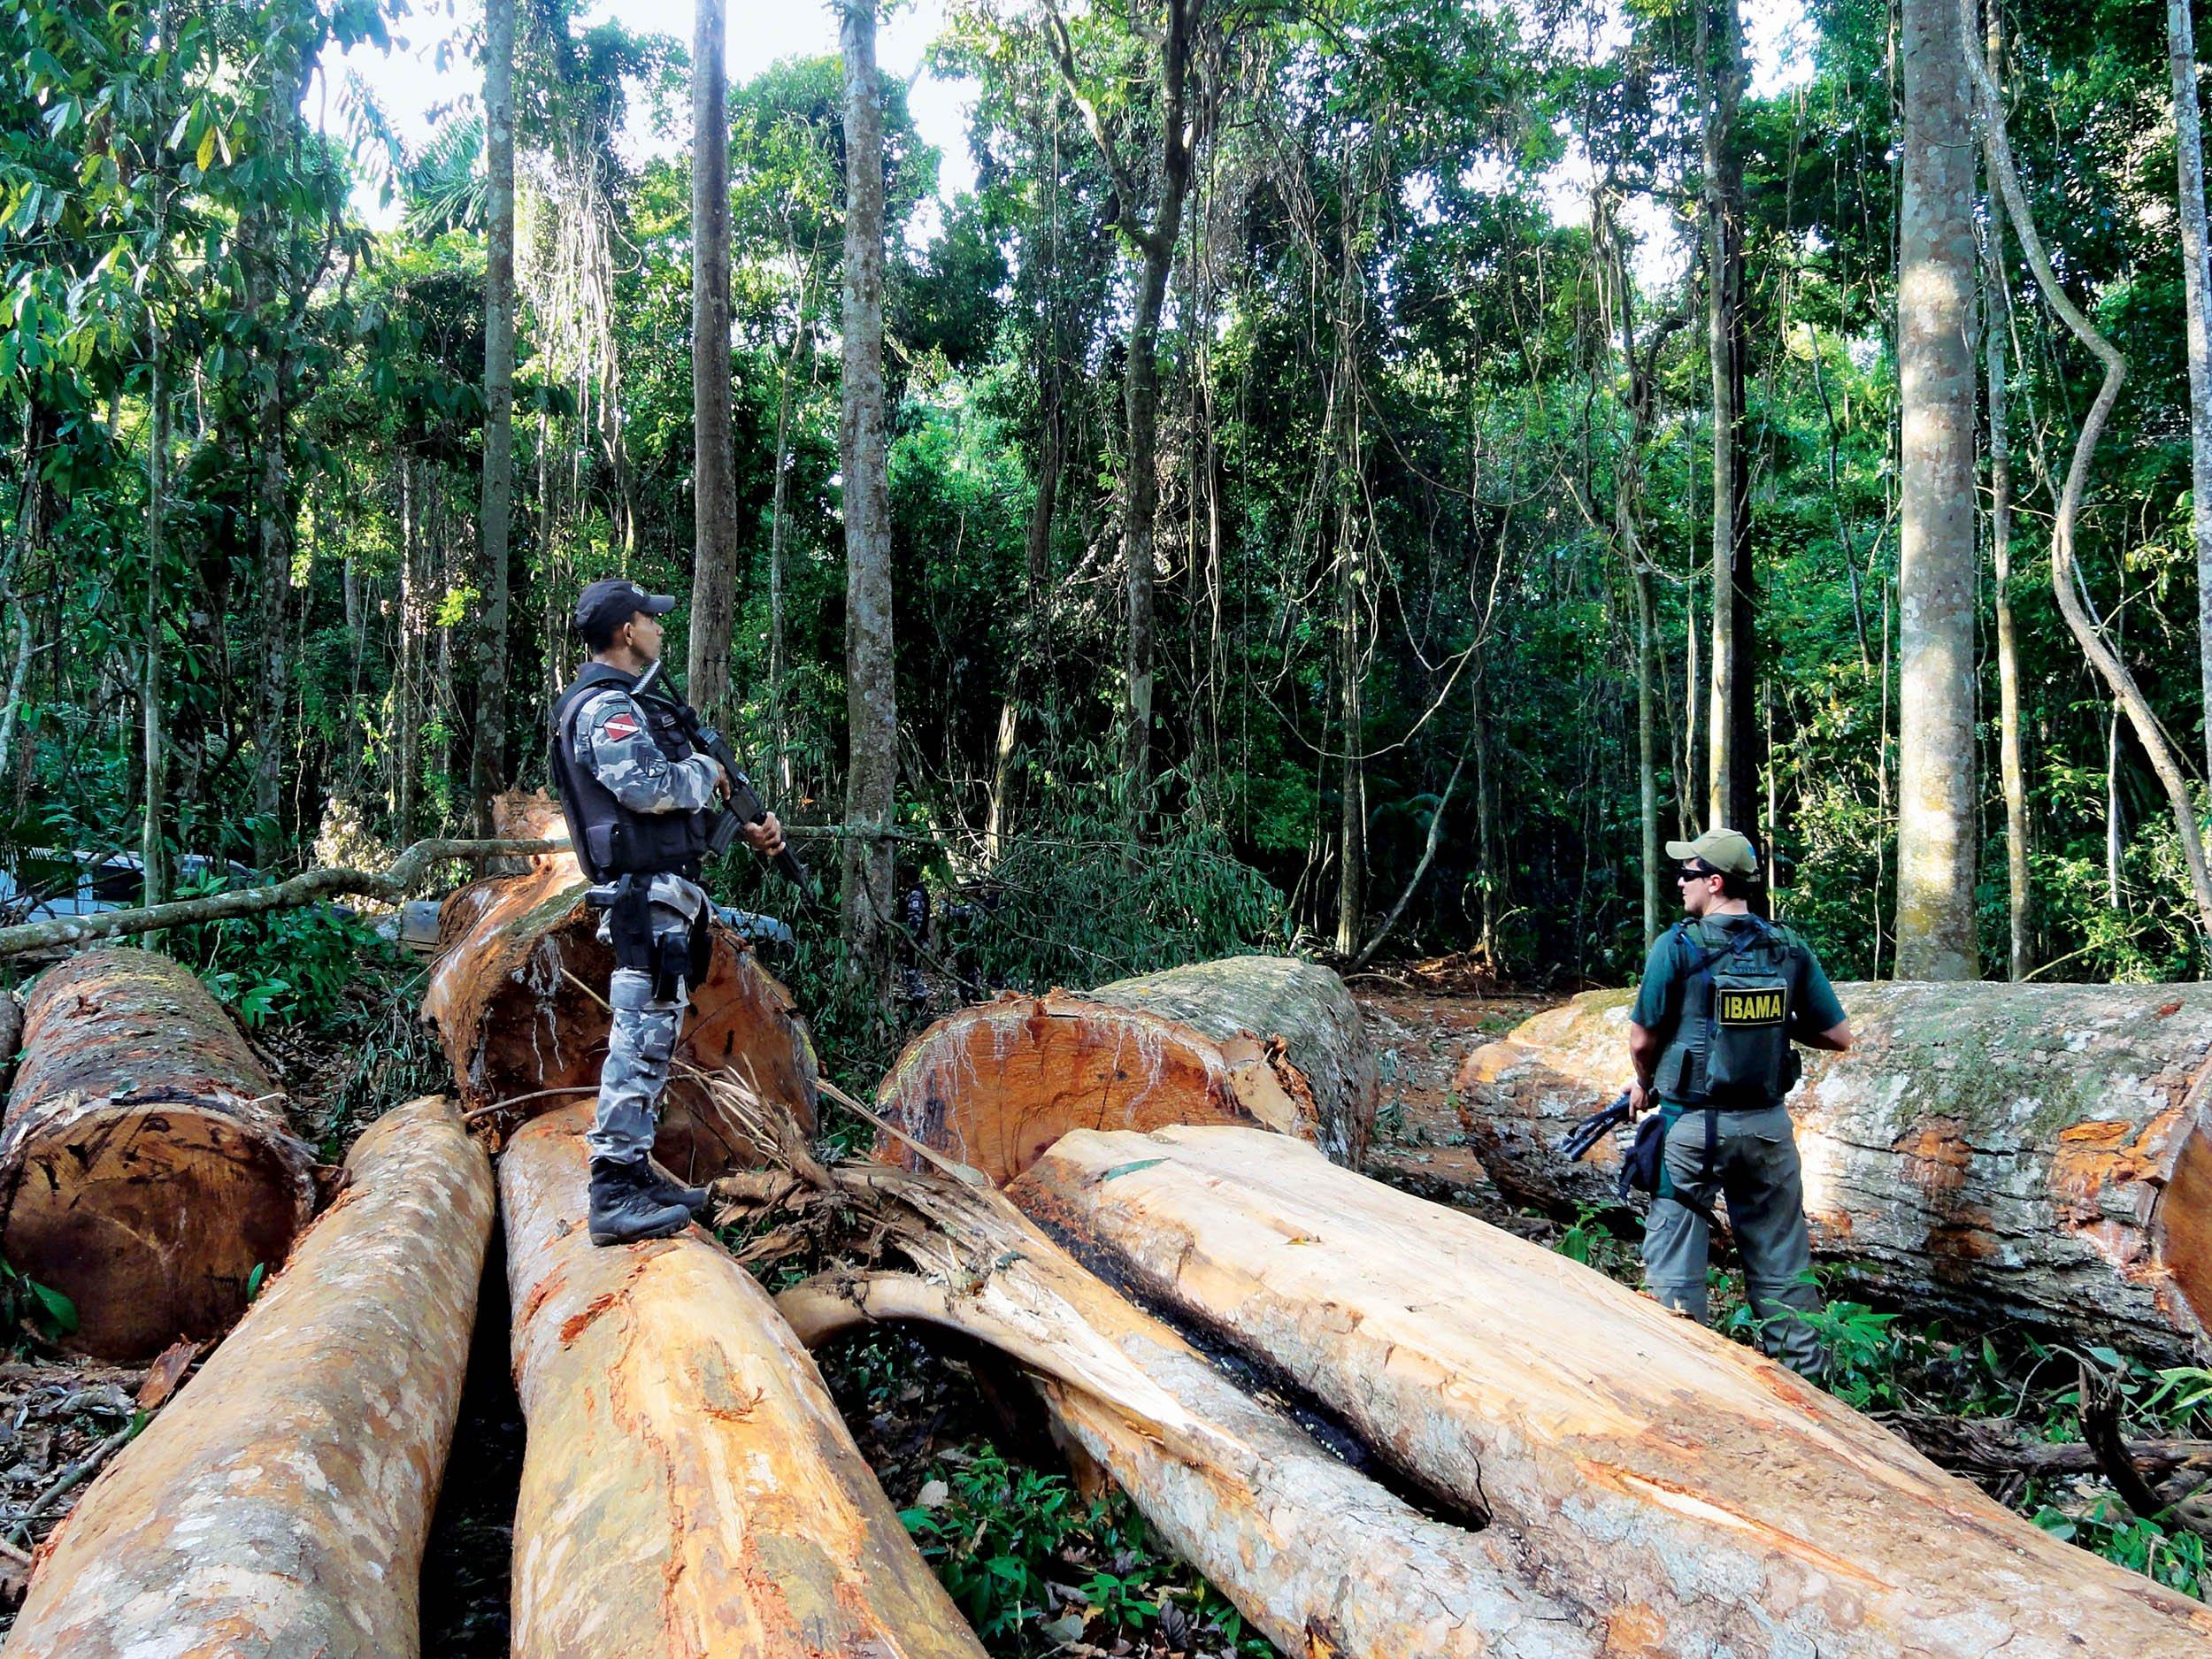 03_27_BrazilRainForest_01